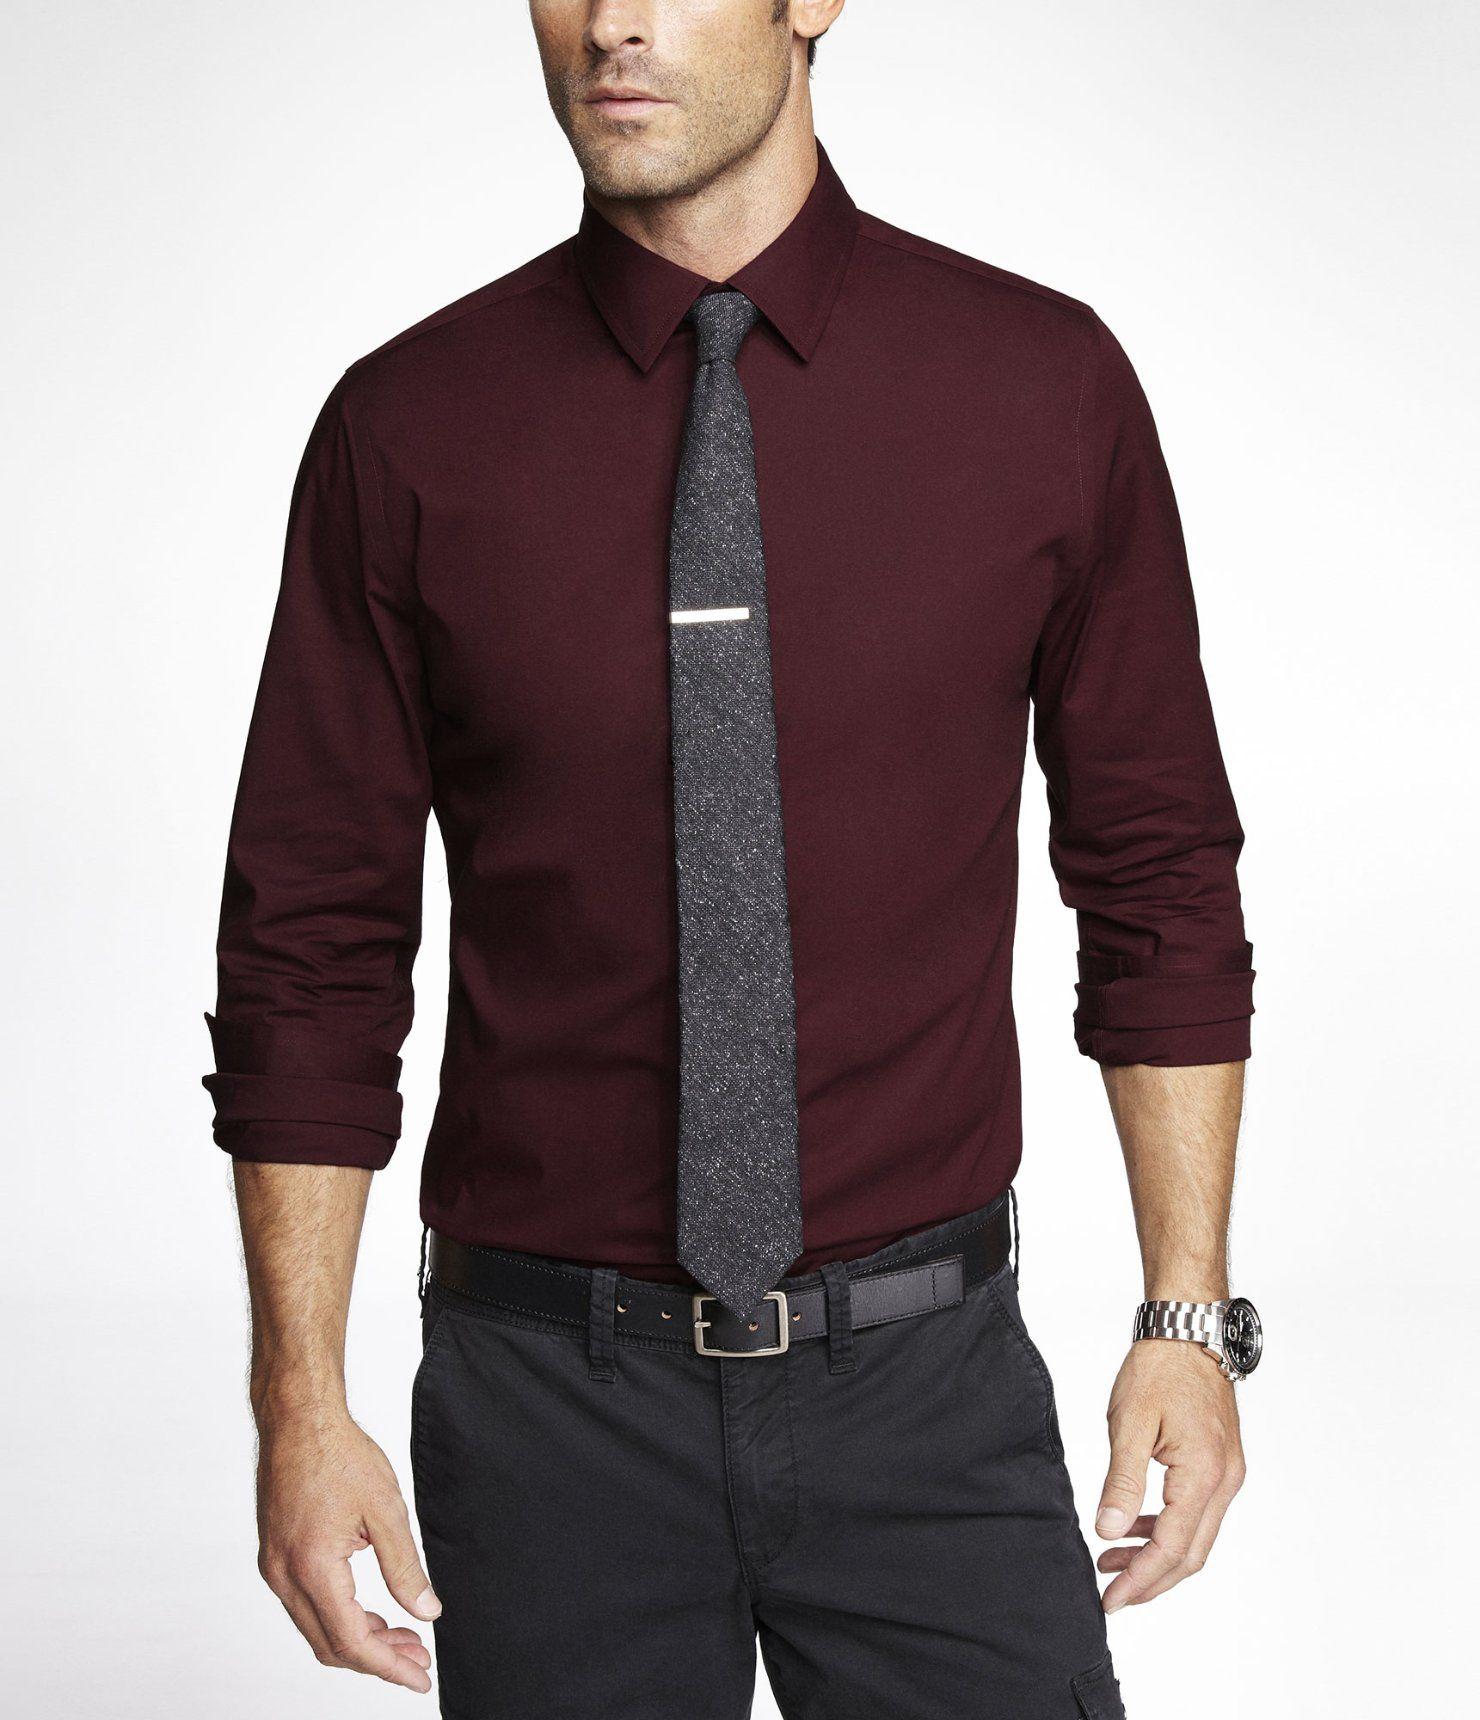 Mens Dress Shirts Shop 1mx Dress Shirts For Men Express Business Casual Men Mens Shirt Dress Formal Men Outfit [ 1720 x 1480 Pixel ]